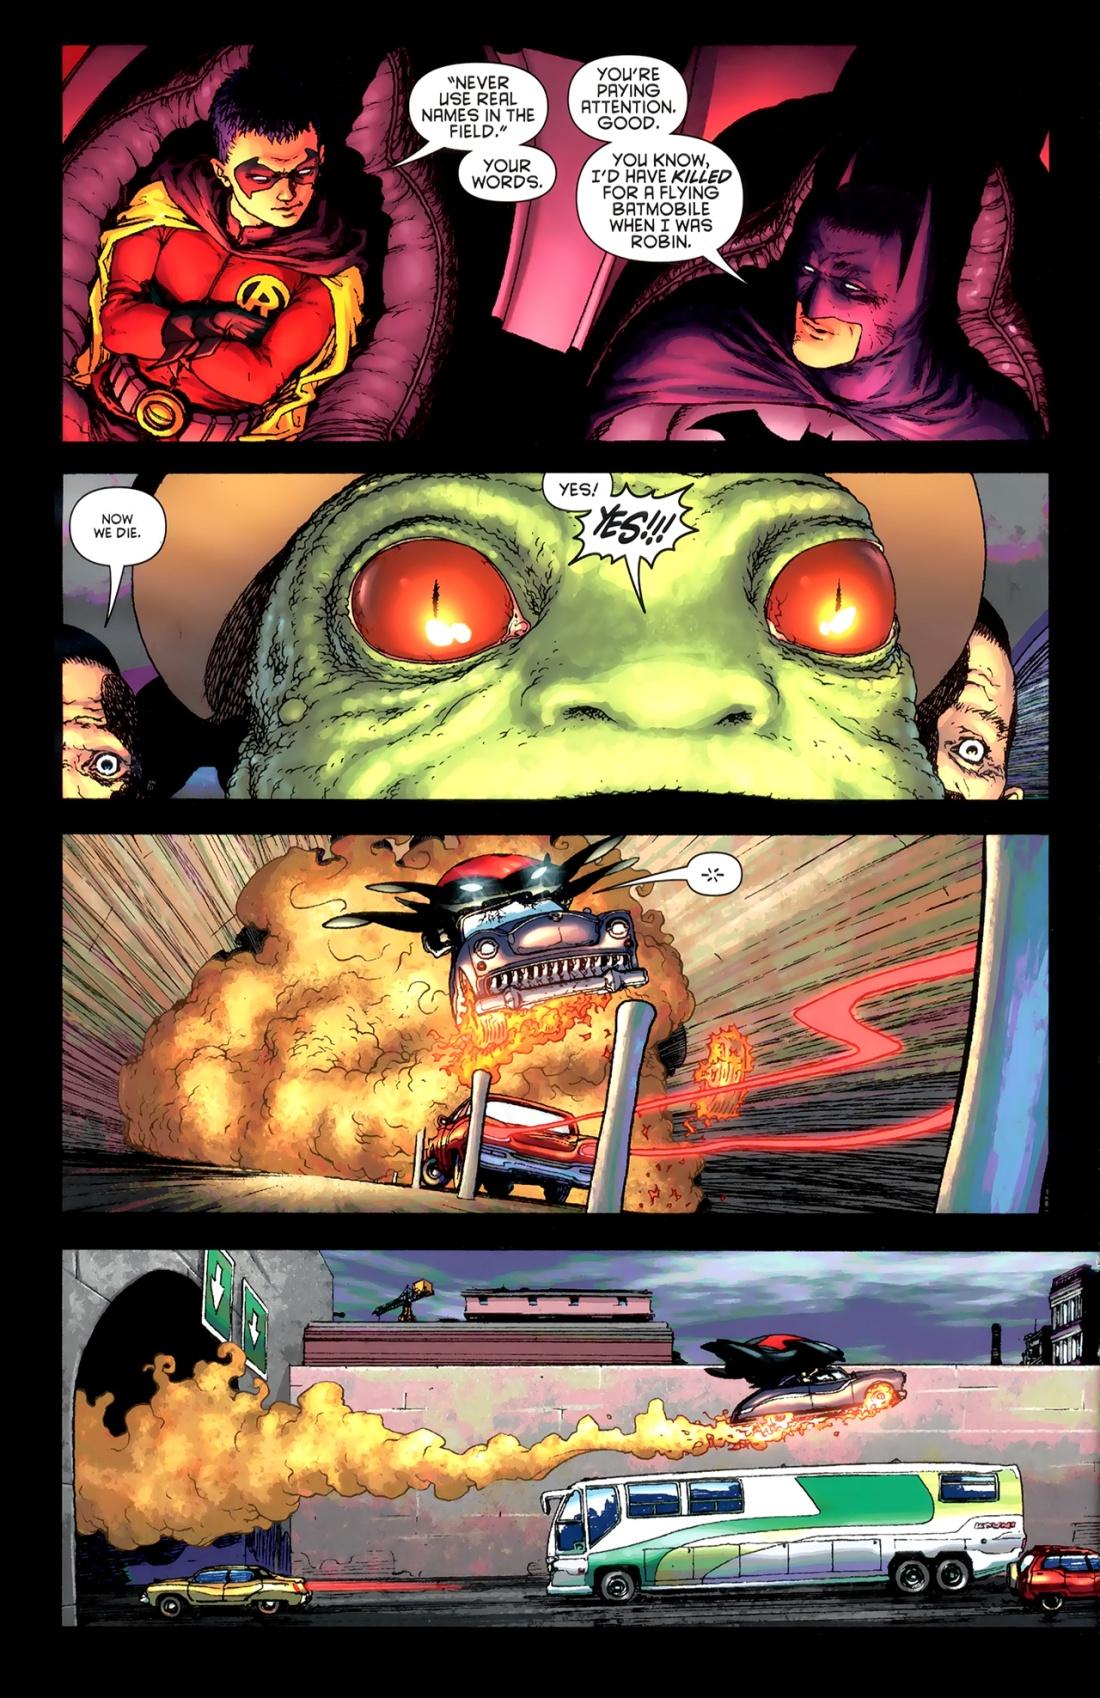 Batman and Robin - Dick Grayson & Damian